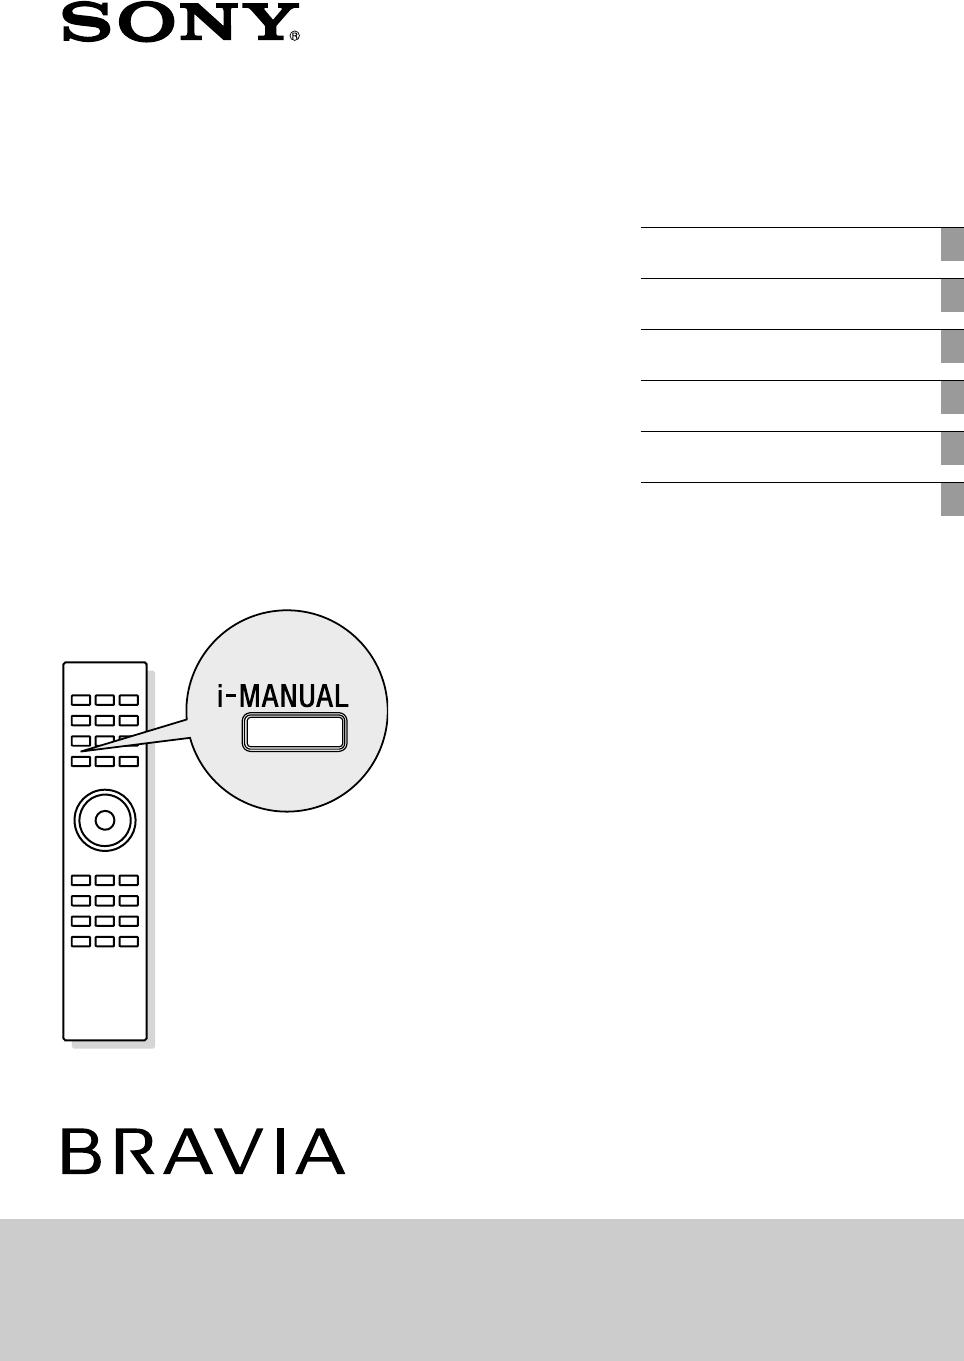 Sony Bravia Kdl 40ex720 Mode D Emploi